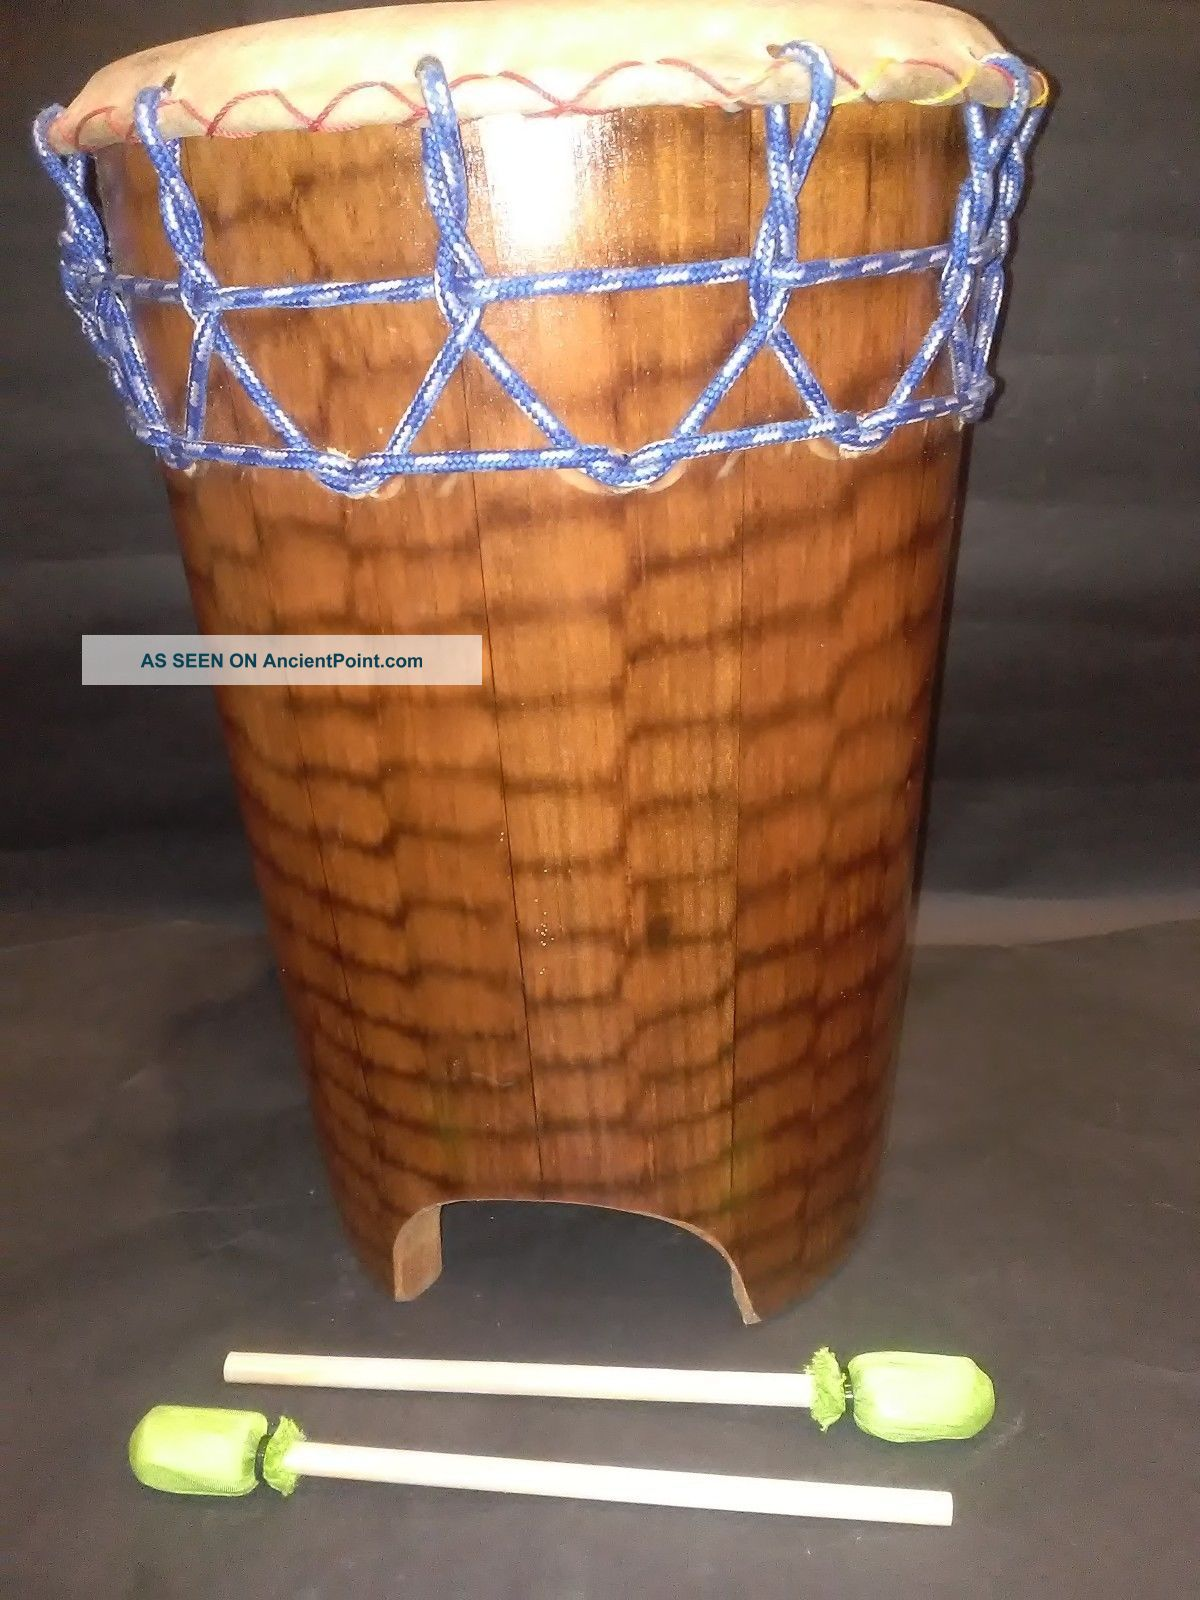 Mexican Huehuetl Drum Native Latin American Aztec Musical Percussion Instrument Percussion photo